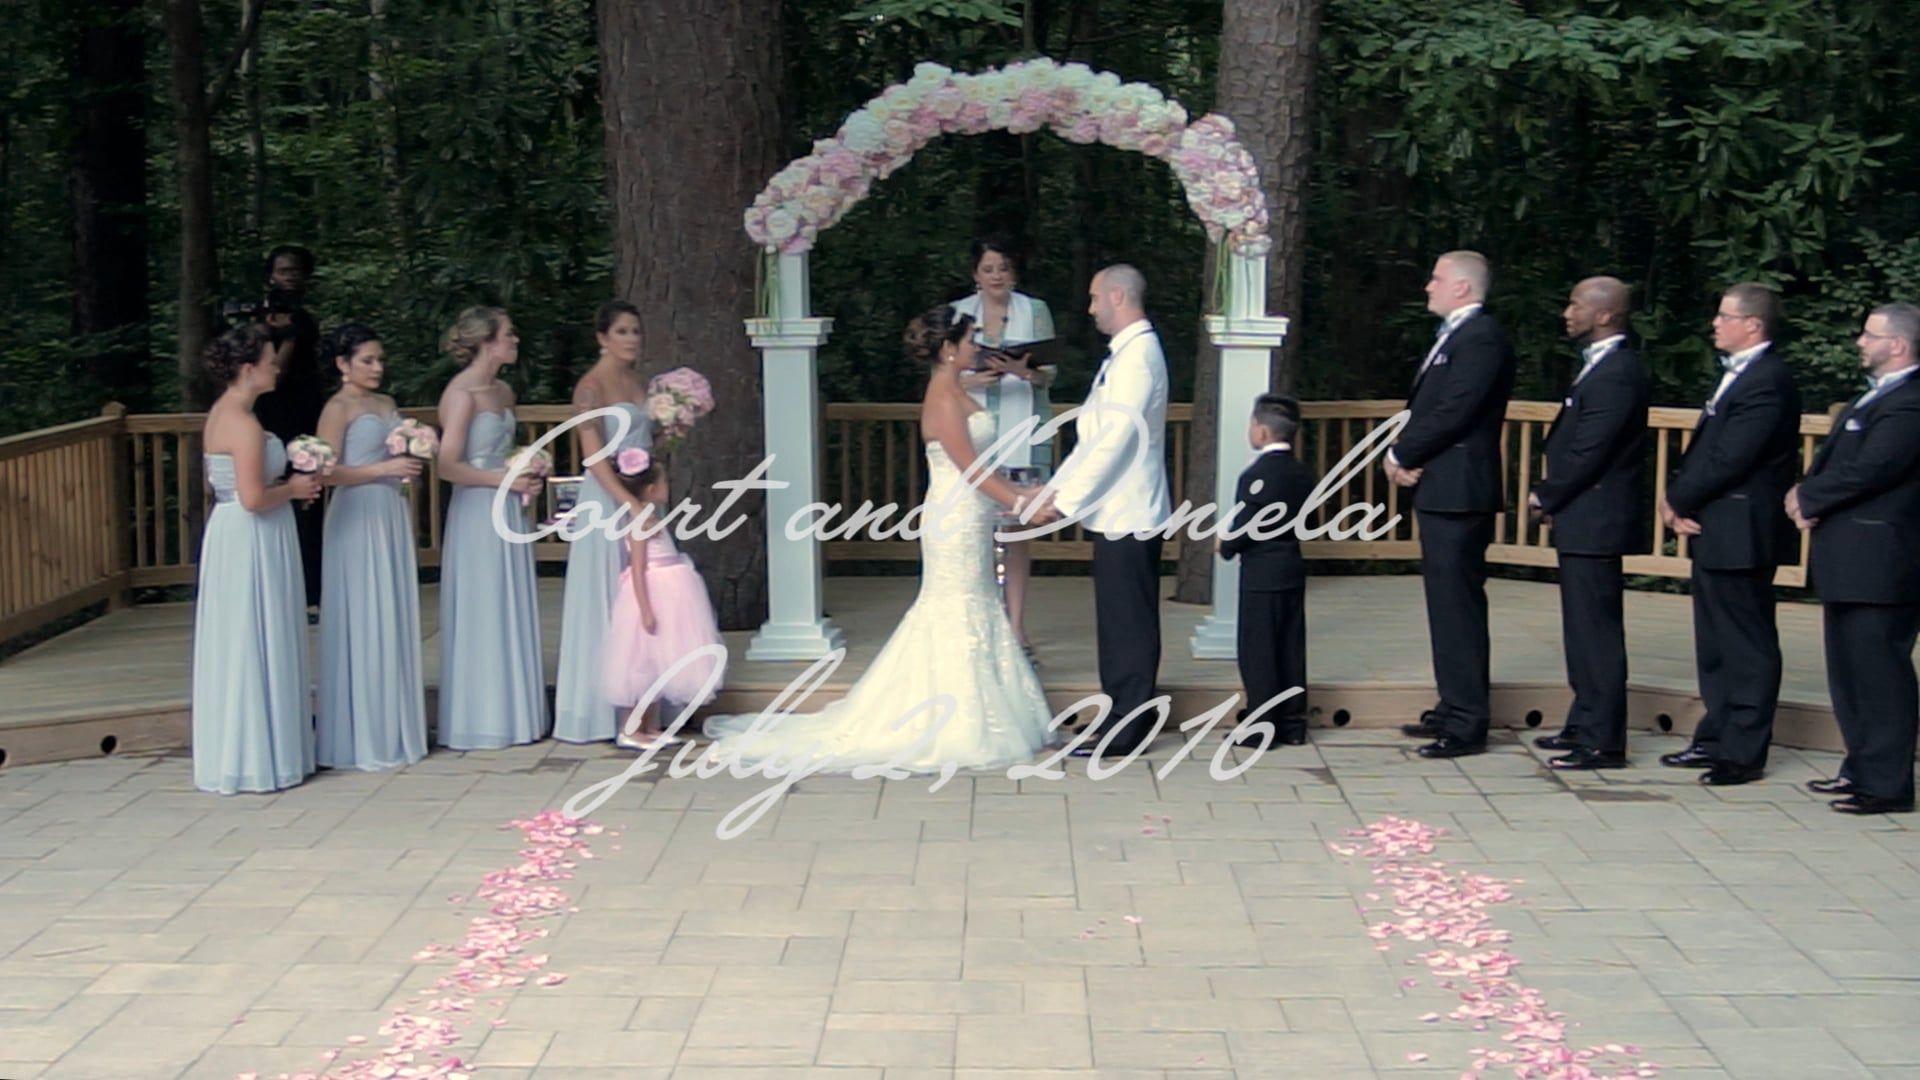 Wedding Video  The Glenwood Club - Raleigh, NC: Court and Daniela's Wedding Highlight Film